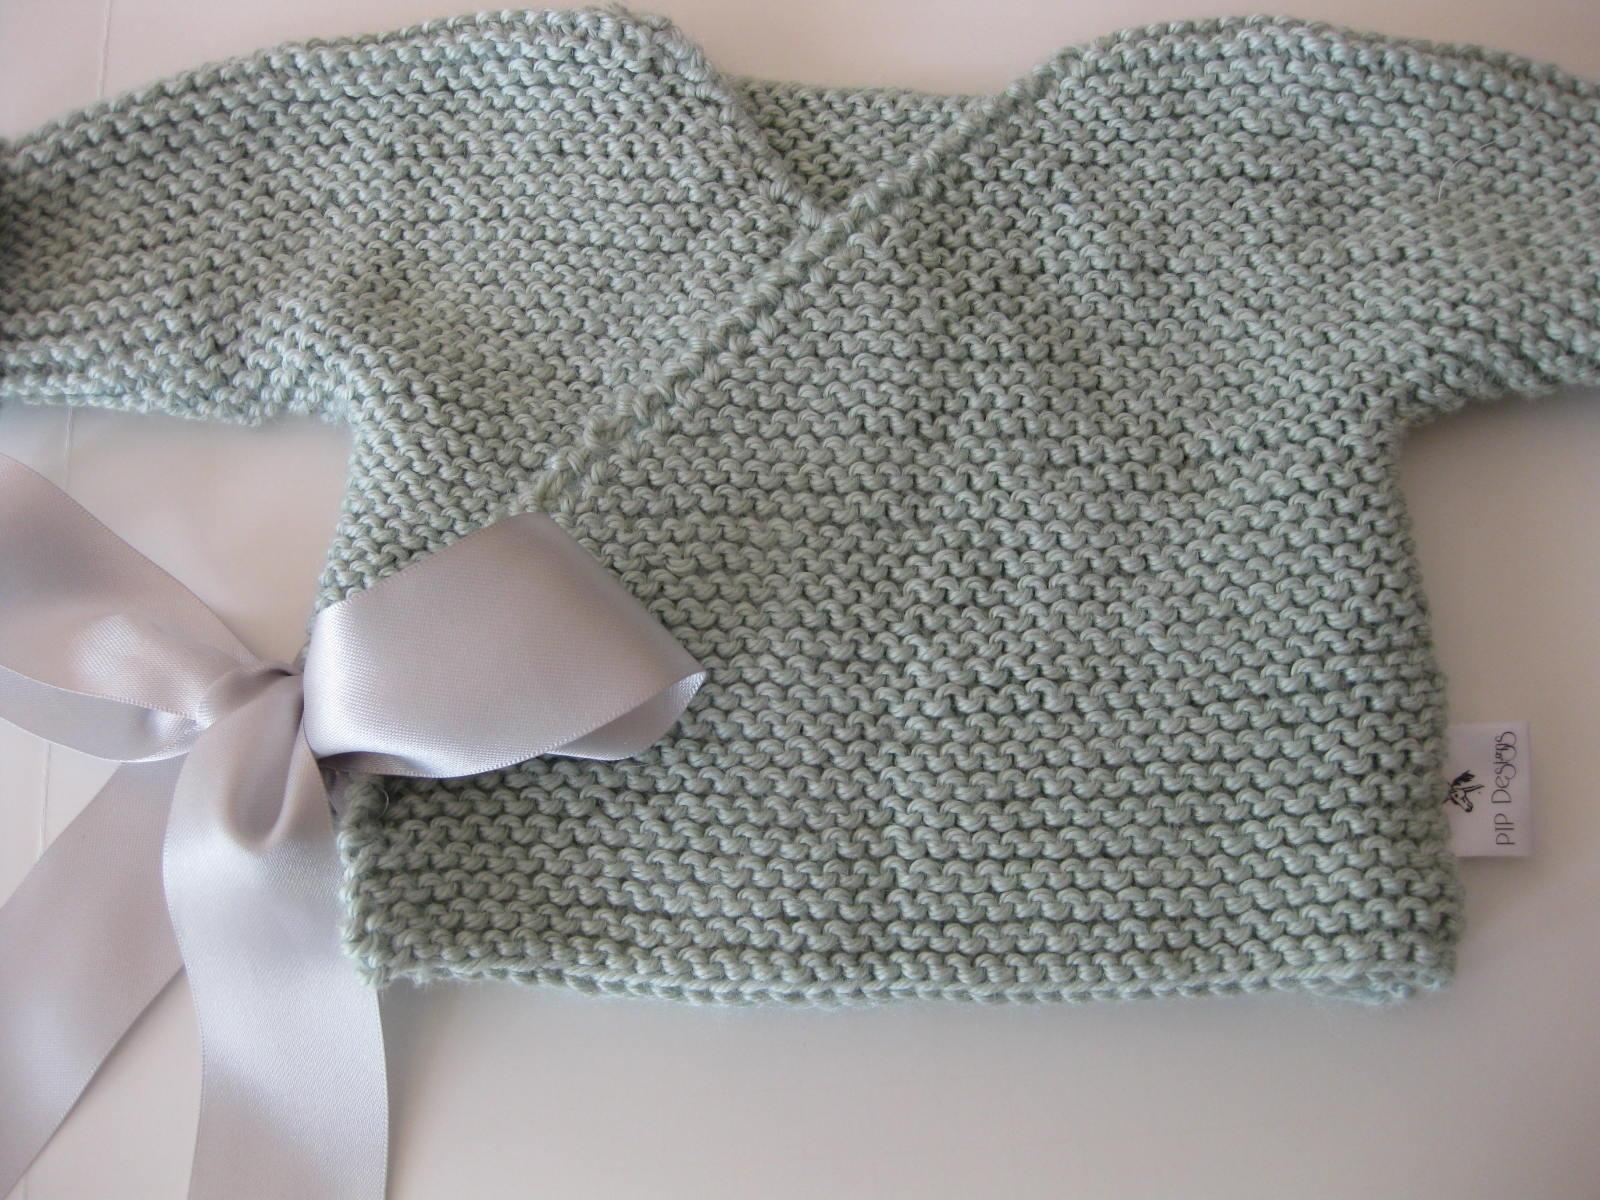 SEWmuchKNITting: Baby kimono - garter stitch